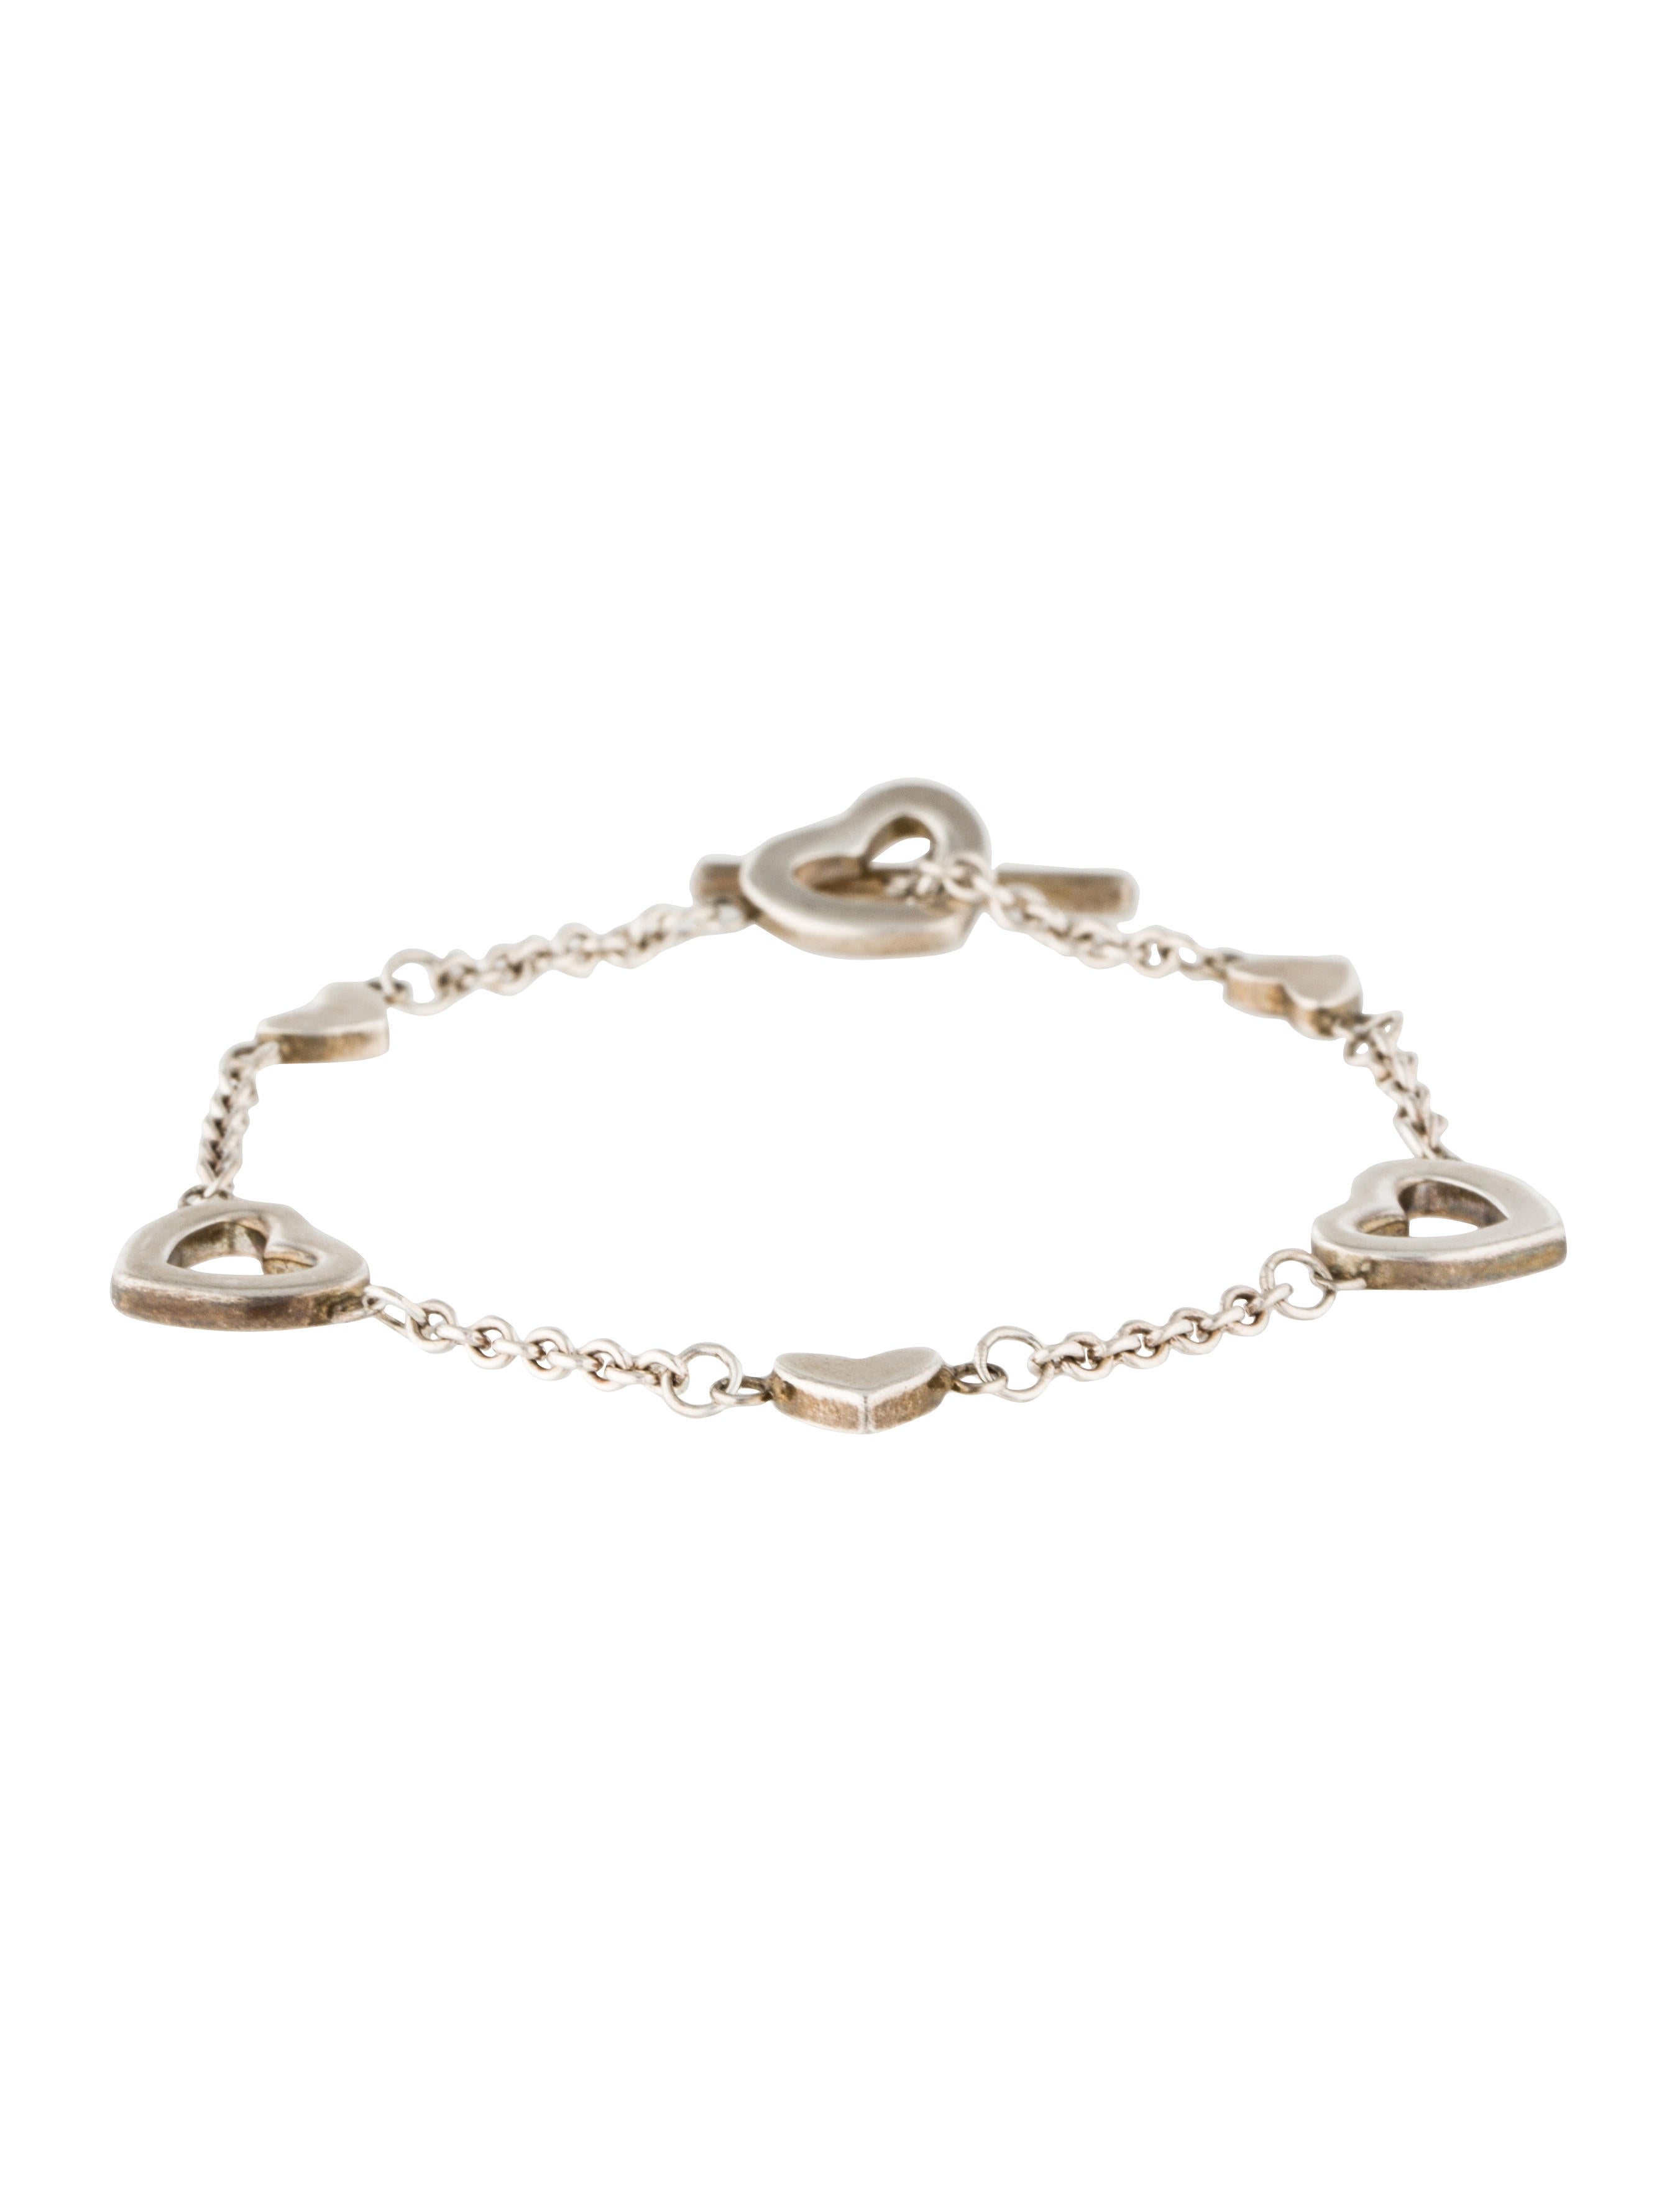 Tiffany Amp Co Open Heart Charm Bracelet Bracelets